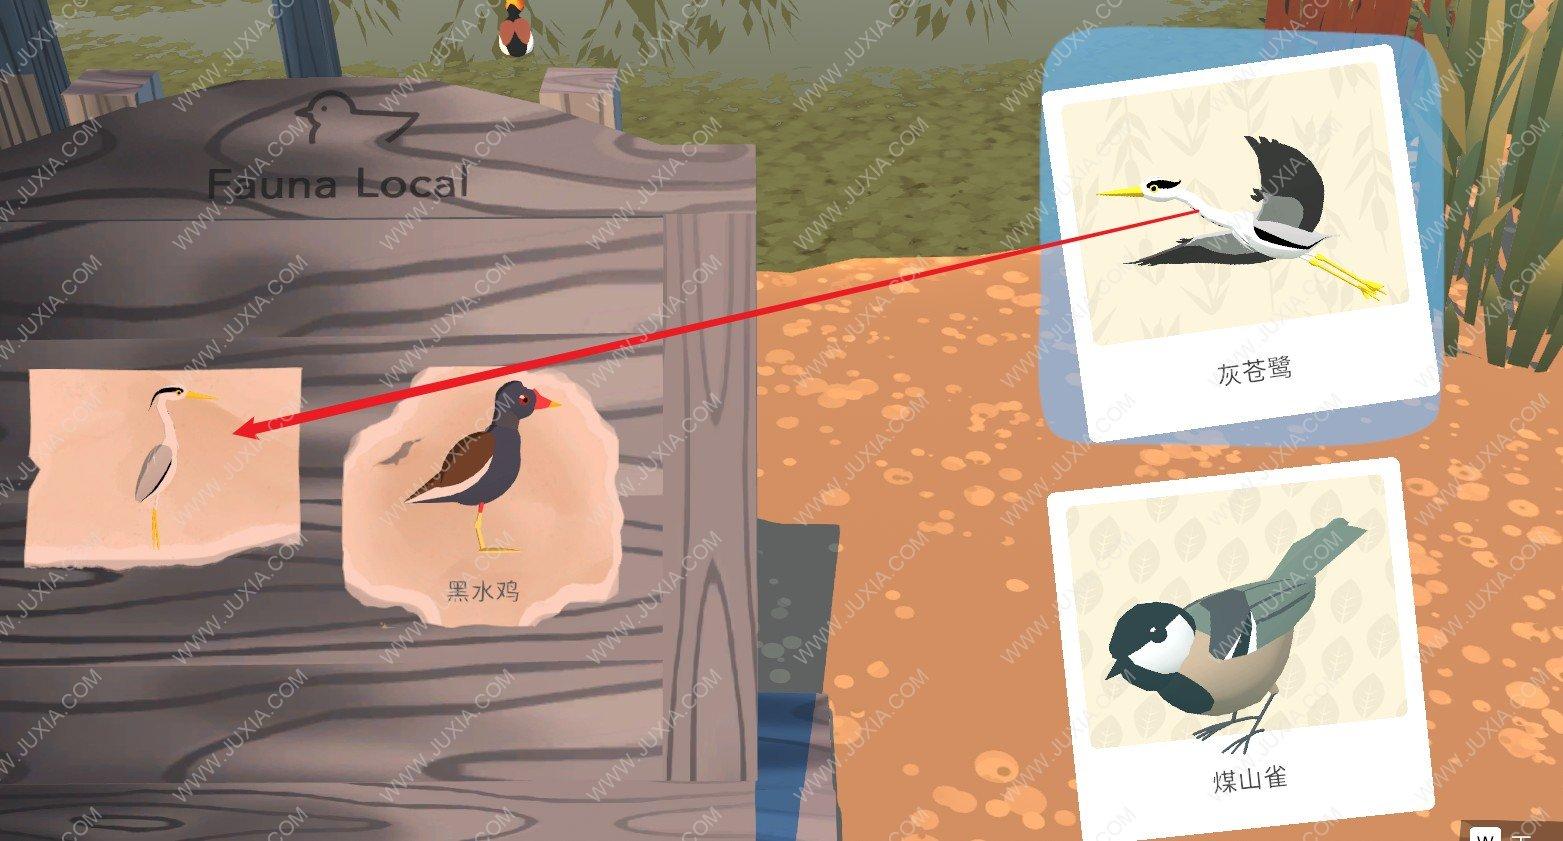 Alba攻略第三章怎么过 阿尔芭与野生动物的故事攻略第三天通关方法